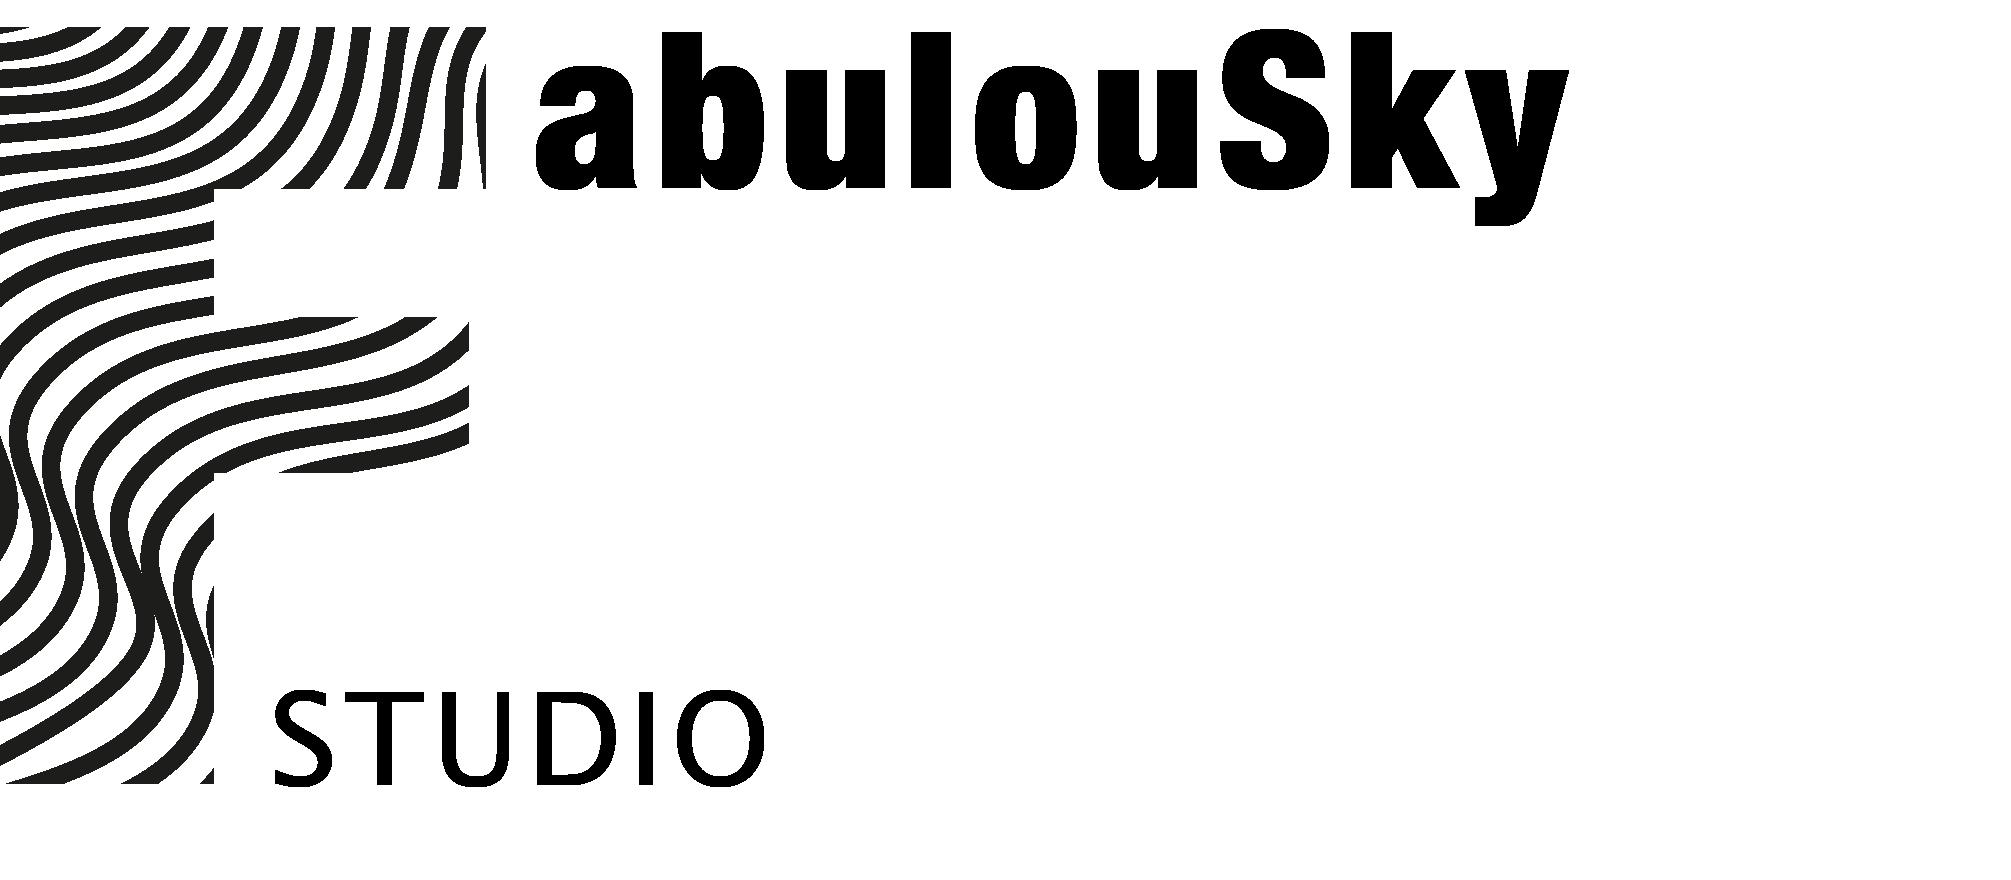 Logo_FabulouSky Studio_Christina Hein